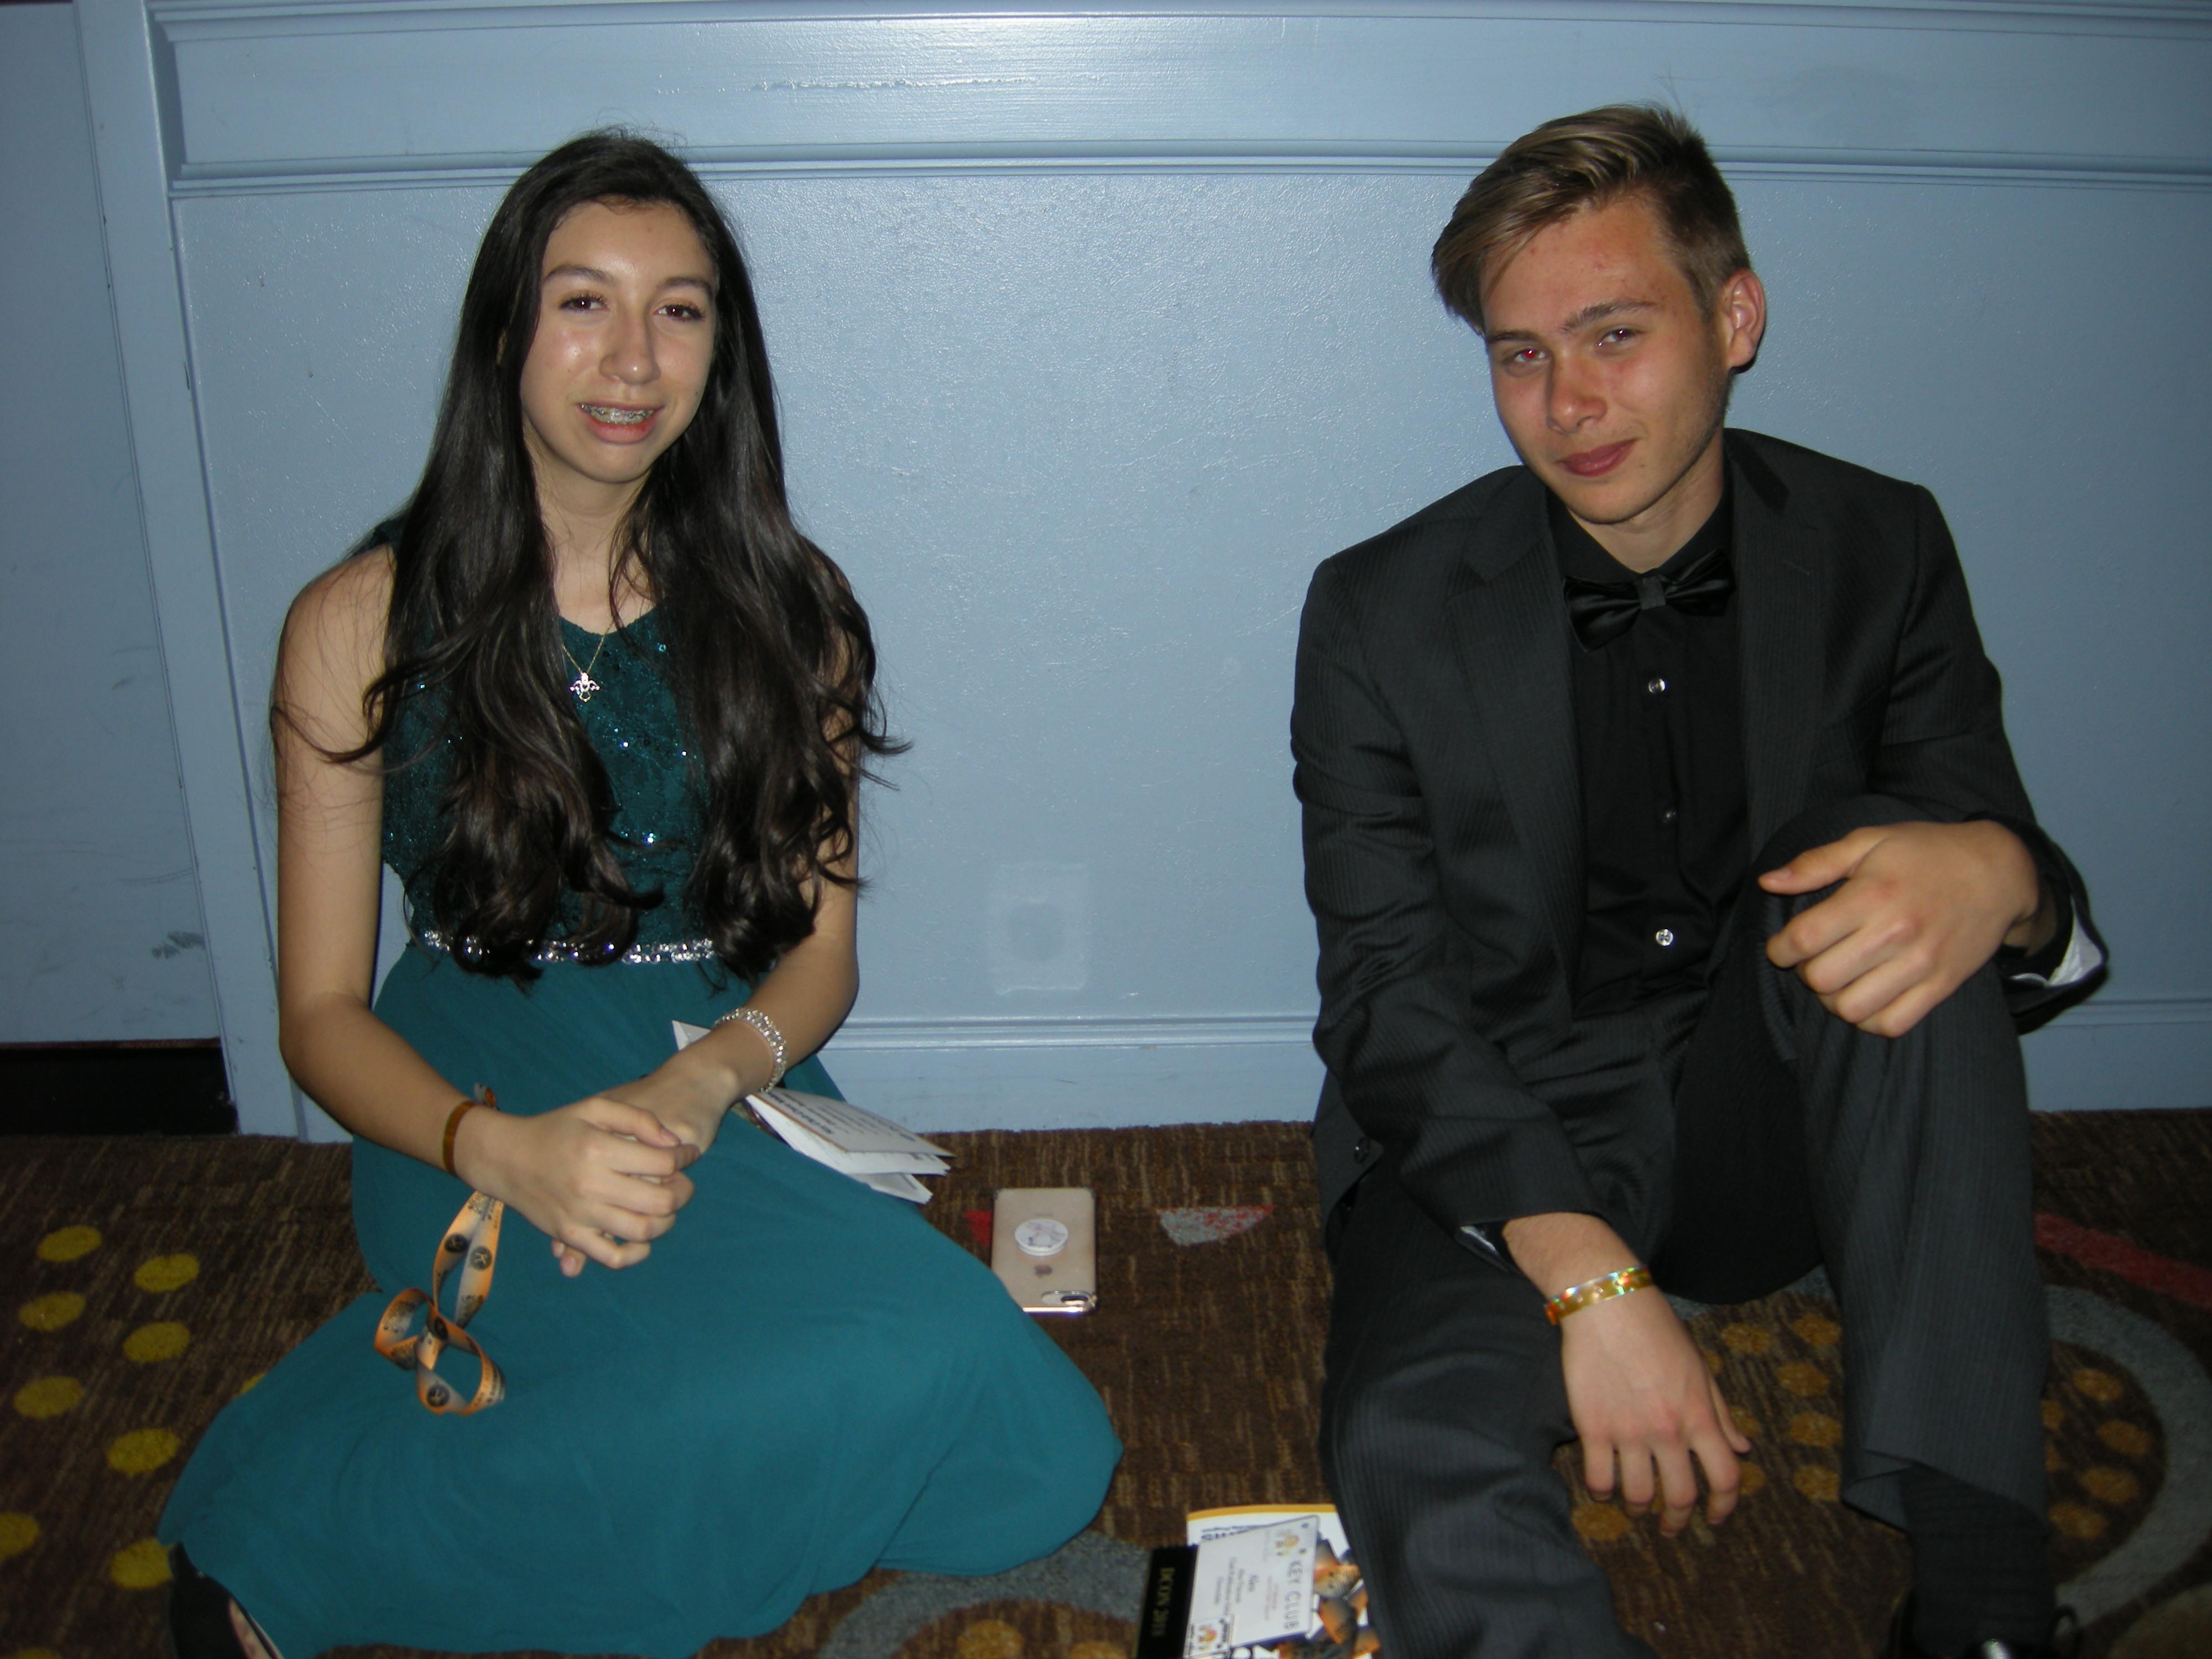 Anahi and Alex